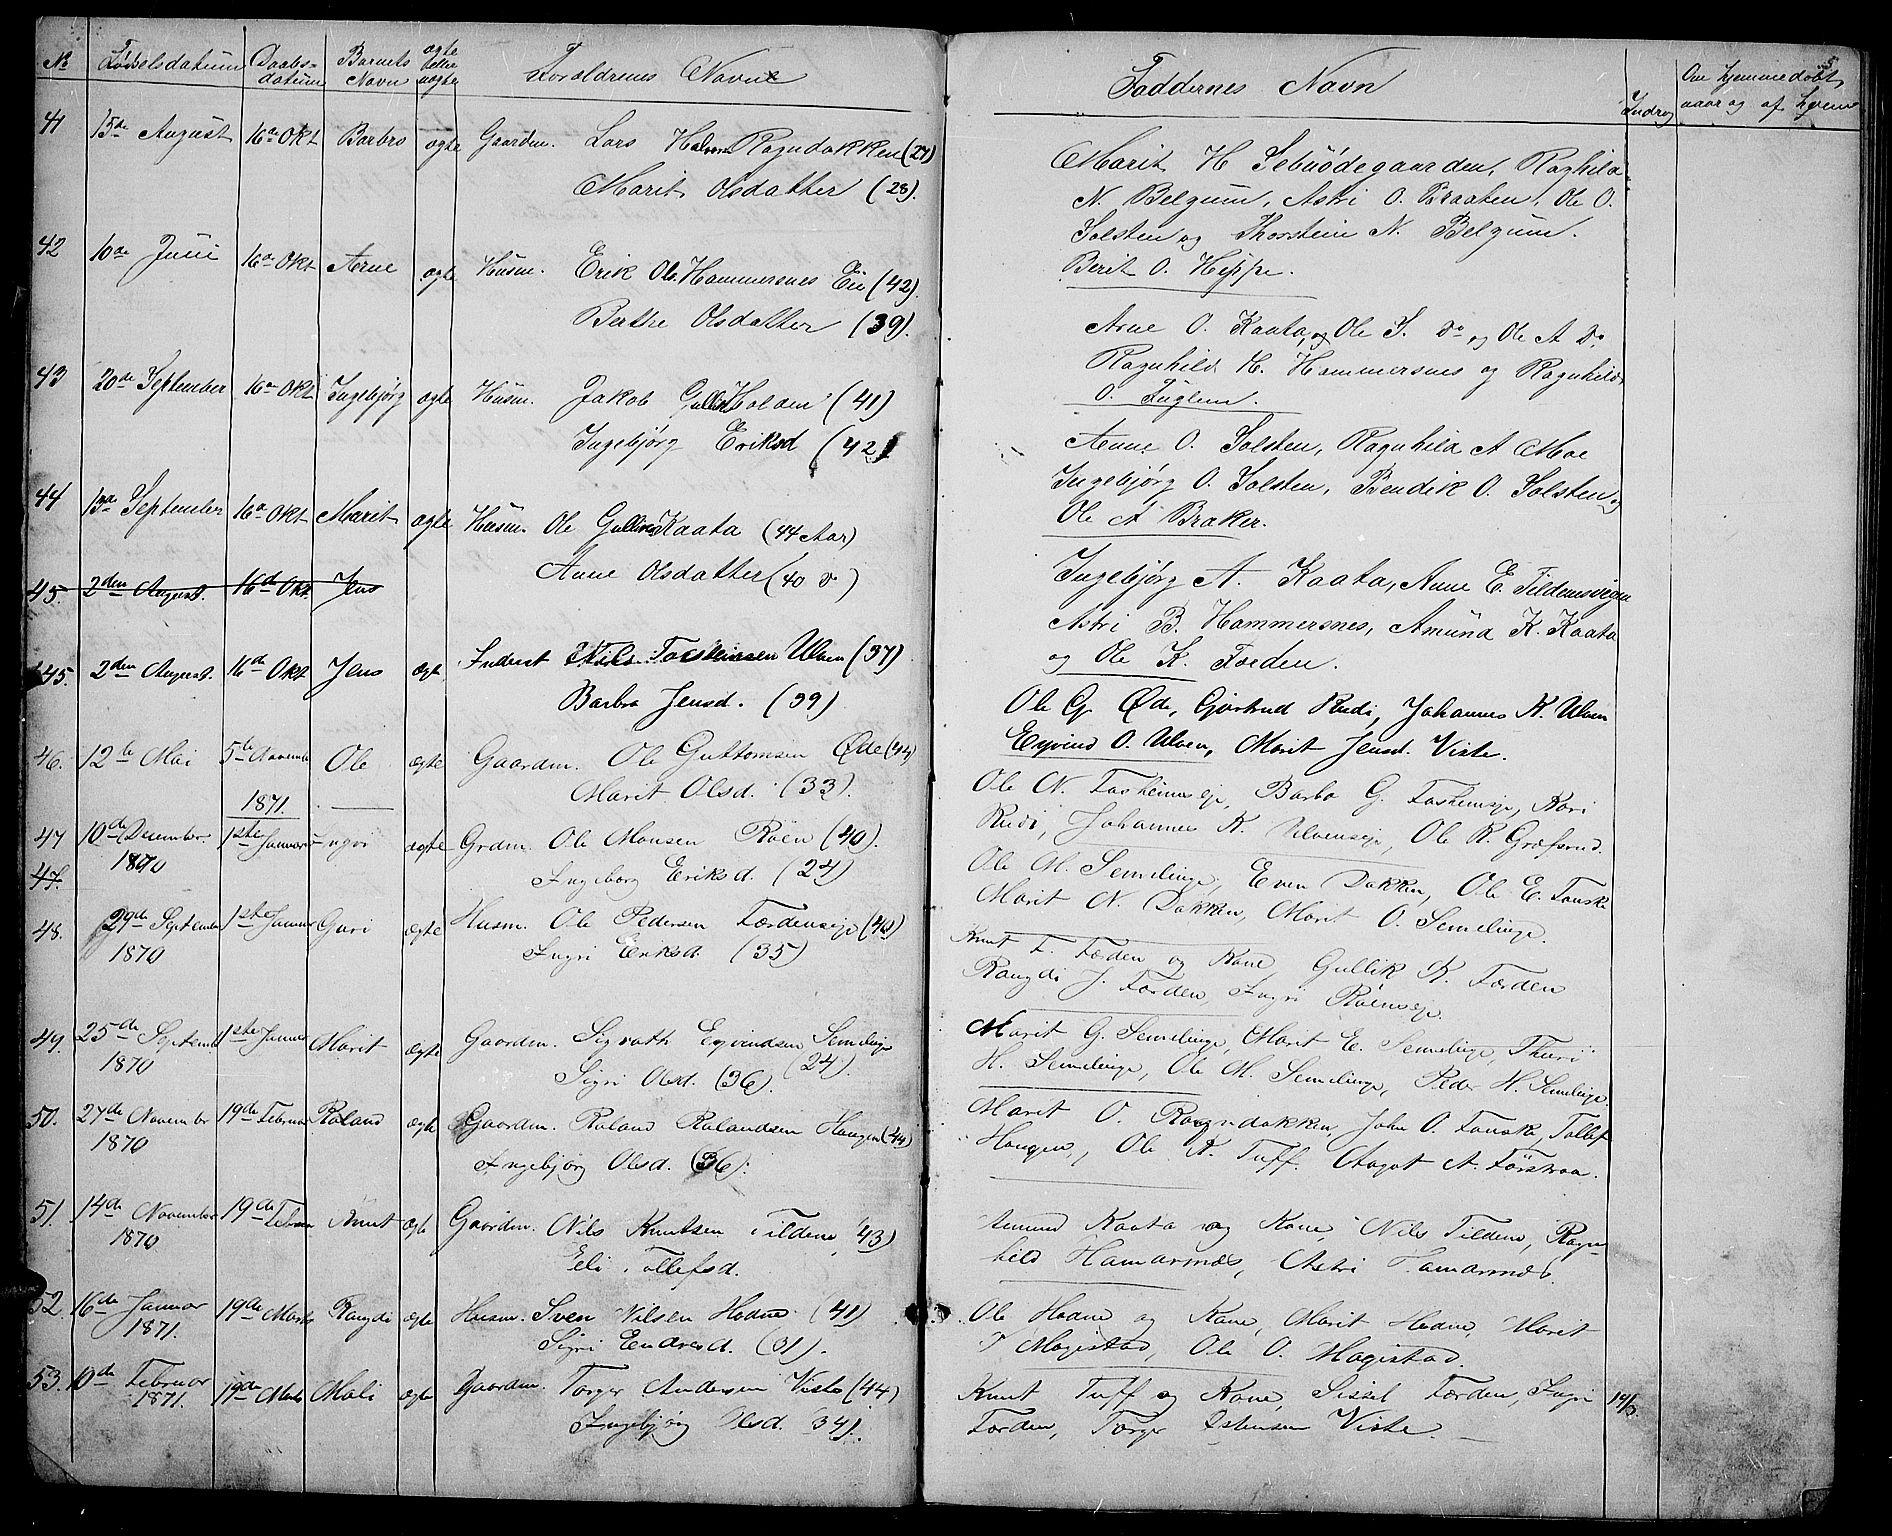 SAH, Vestre Slidre prestekontor, Klokkerbok nr. 3, 1869-1882, s. 5